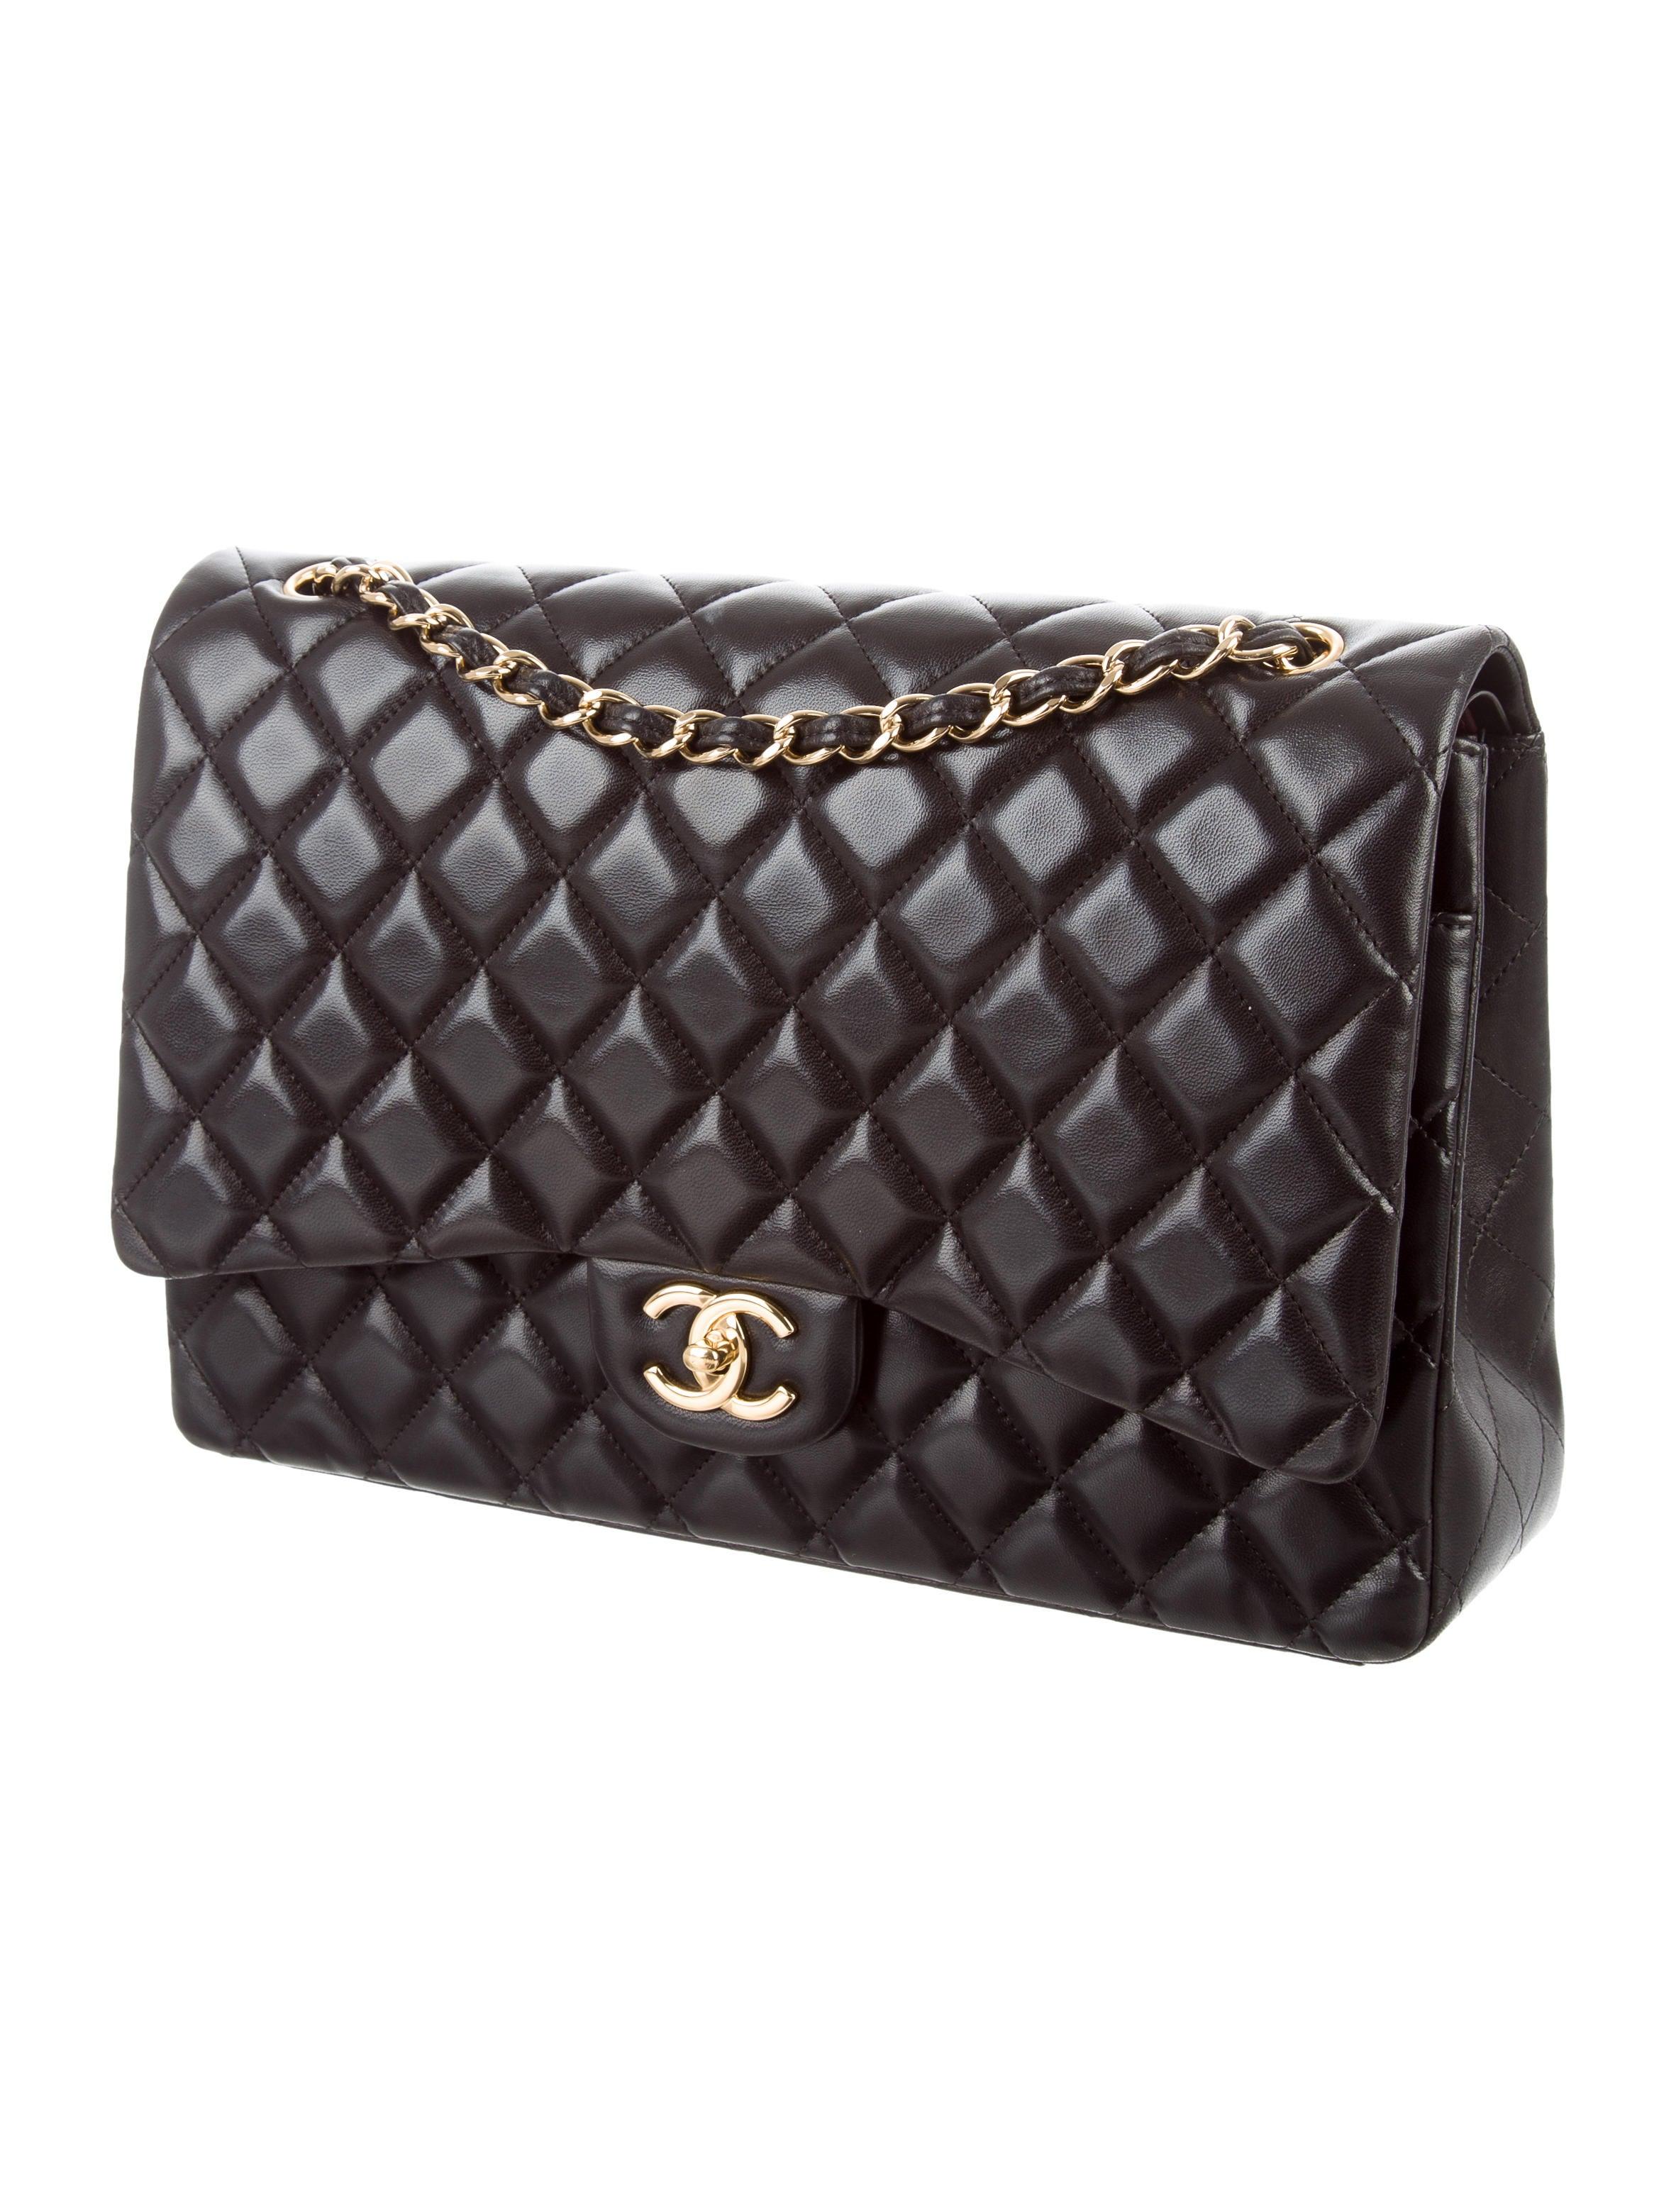 fab6249ffac921 Chanel Classic Flap Quilted Handbags. Chanel Quilted Classic Maxi Single  Flap Bag ...